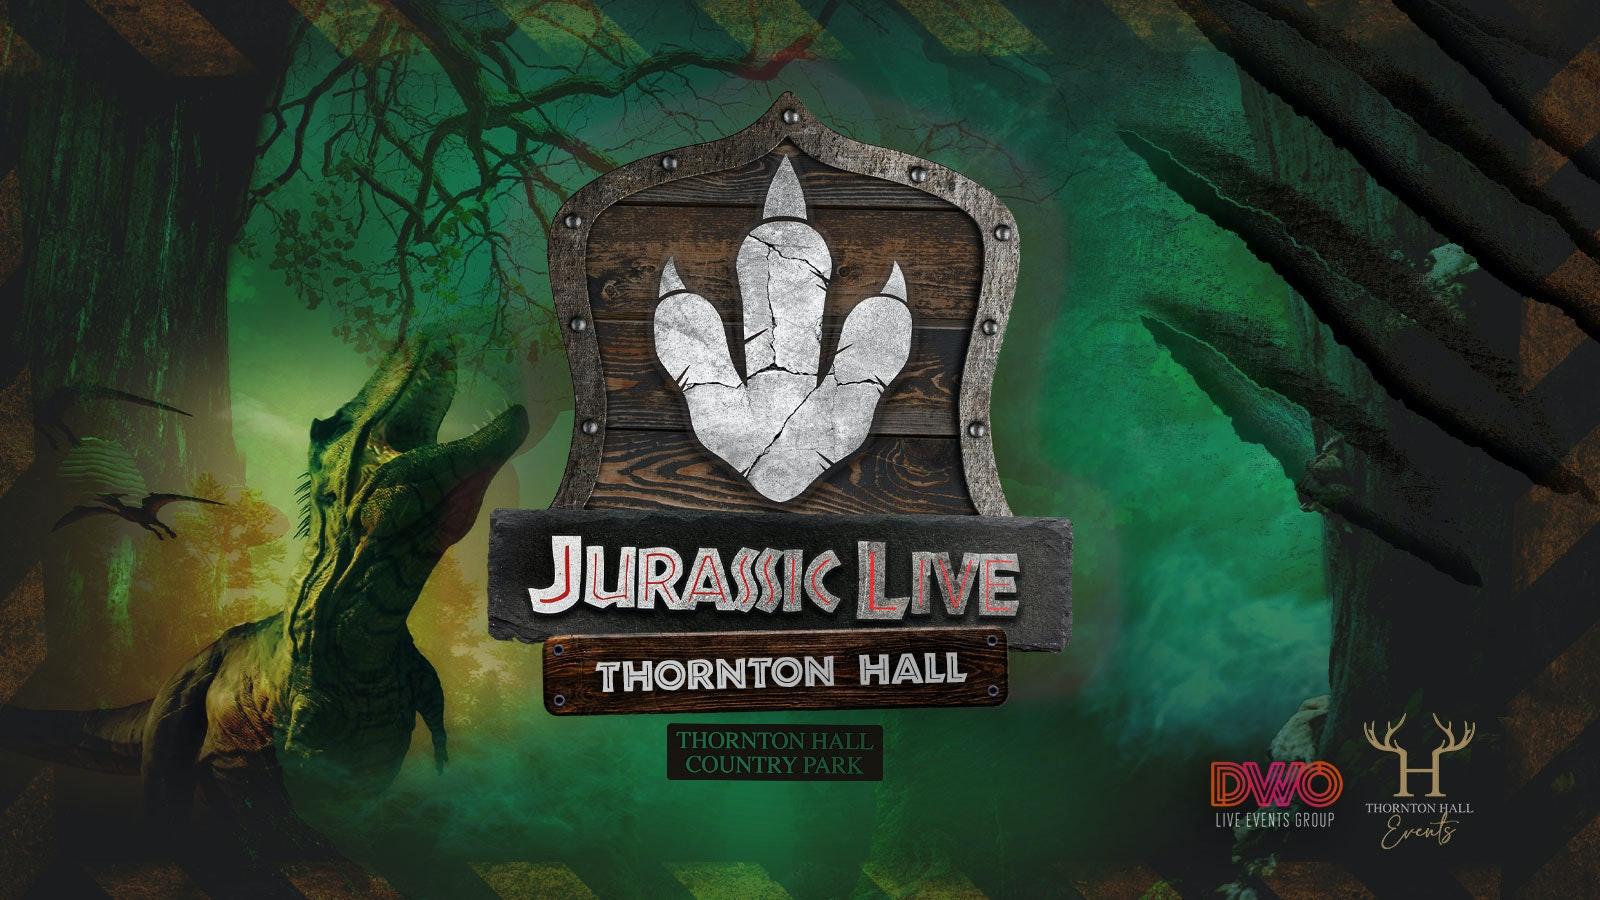 Jurassic Live – Monday 29th March – 10am